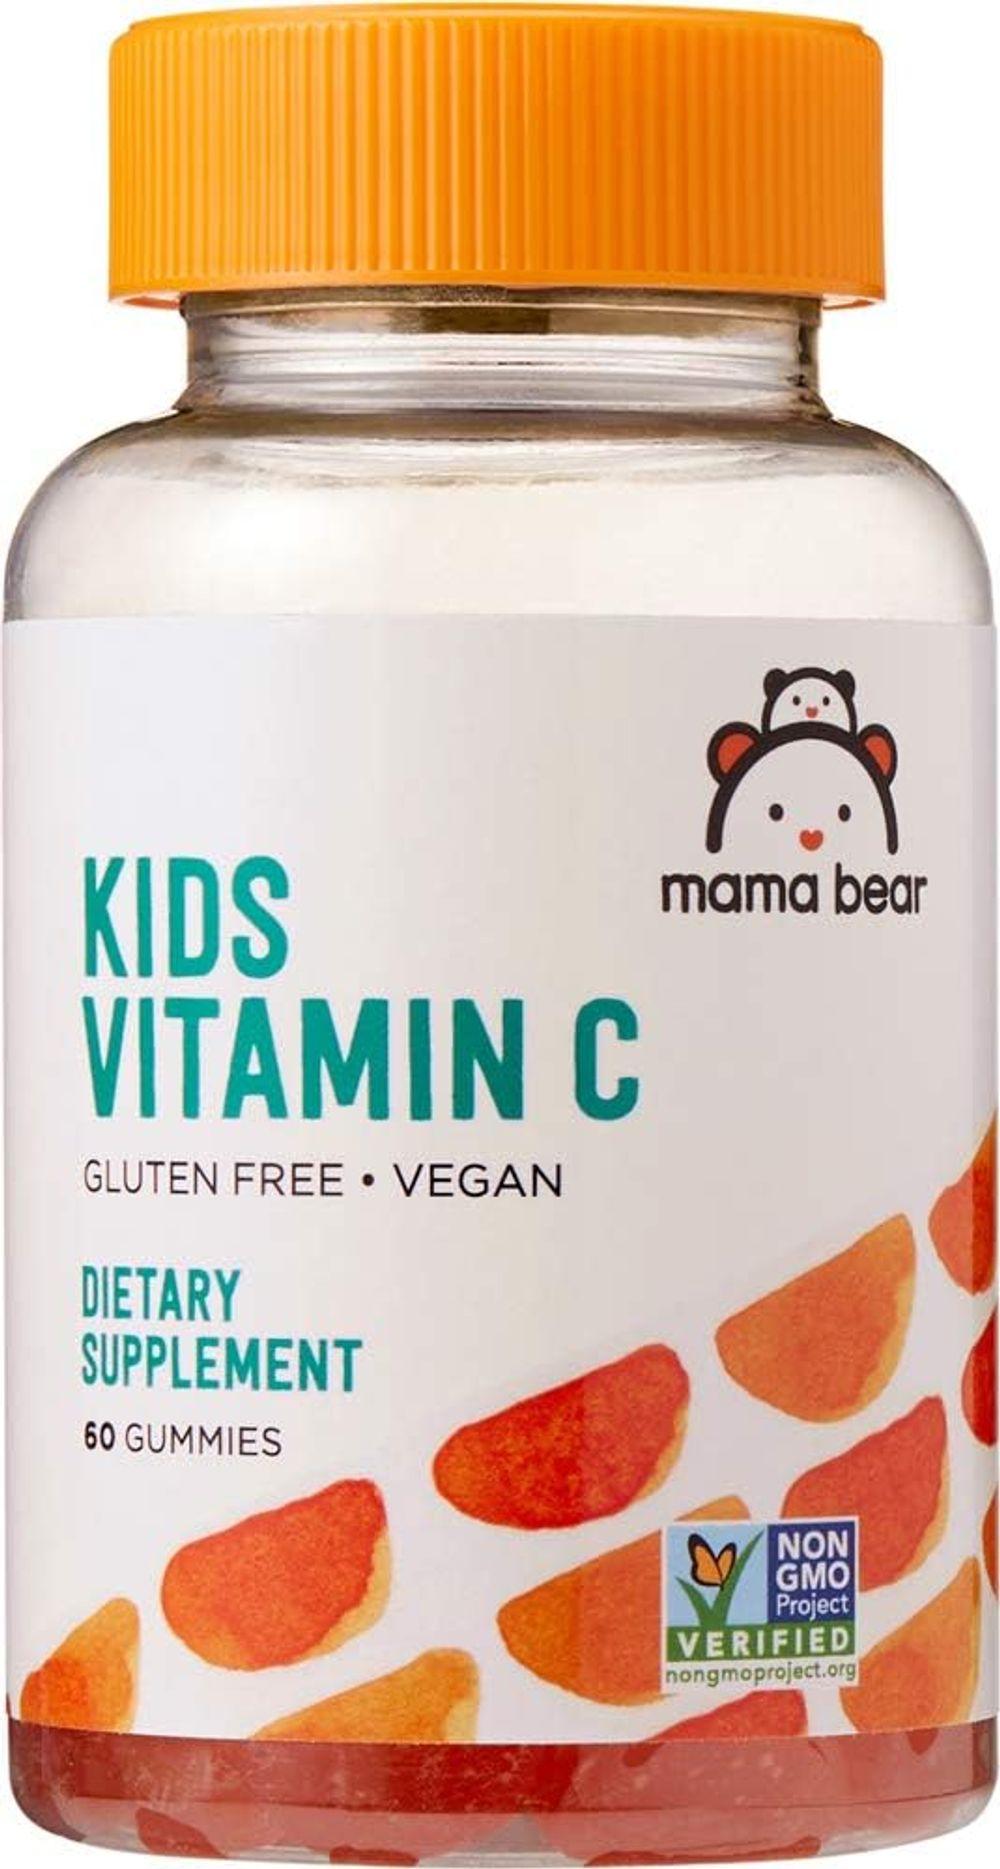 Amazon Brand - Mama Bear Vegan Kids Vitamin C, 60 Gummies, Immune Health, 125 mg Vitamin C per gummy